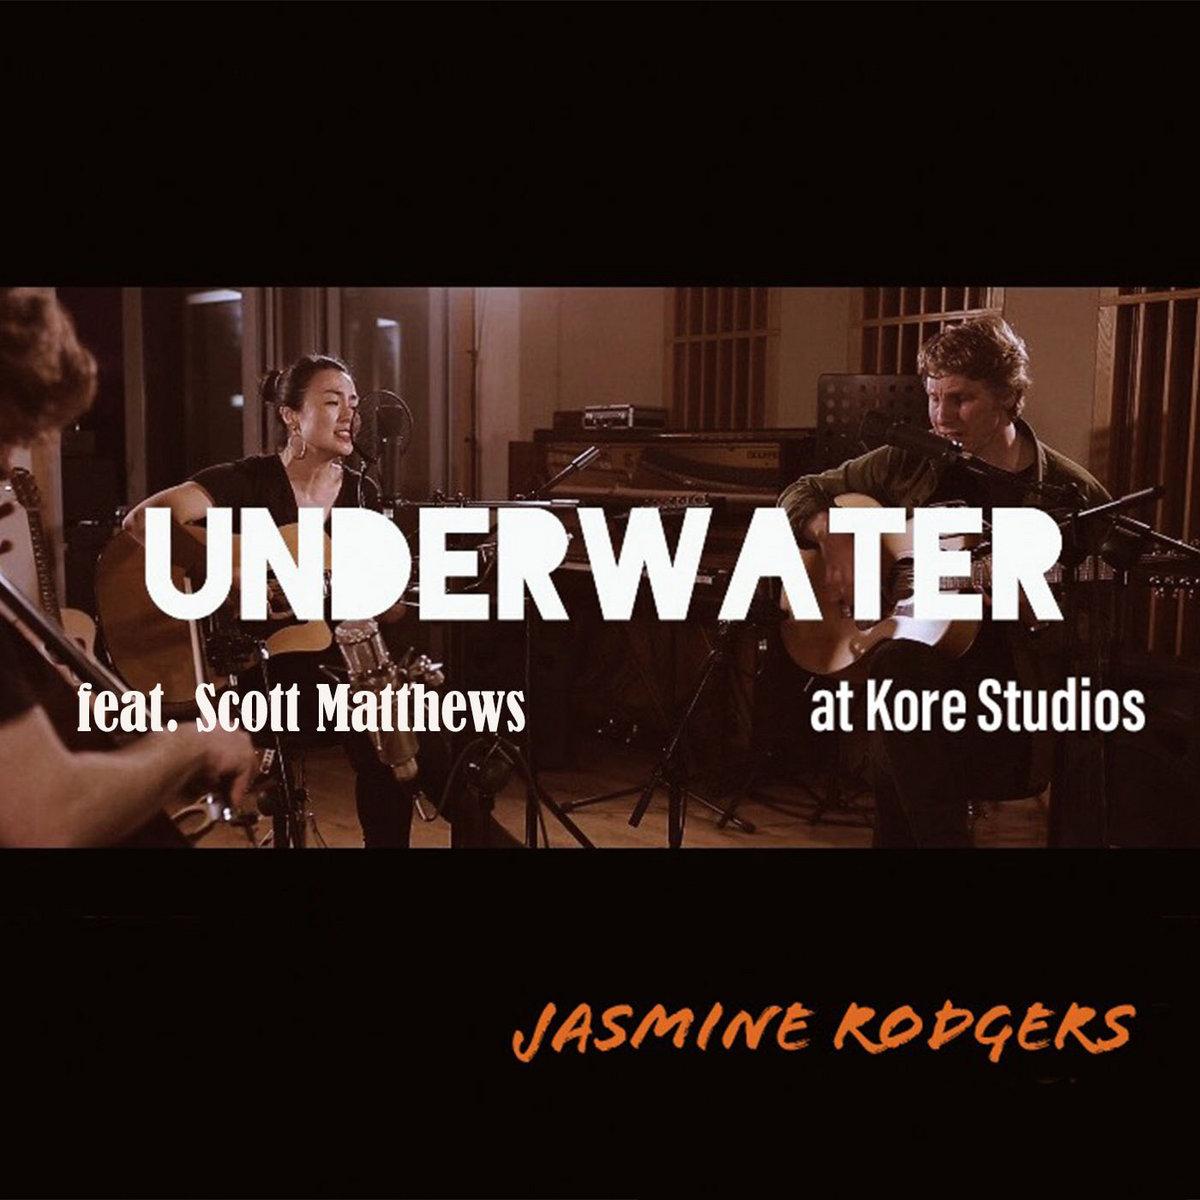 Underwater (Live at Kore Studios) by Jasmine Rodgers, Scott Matthews, Danny Keane